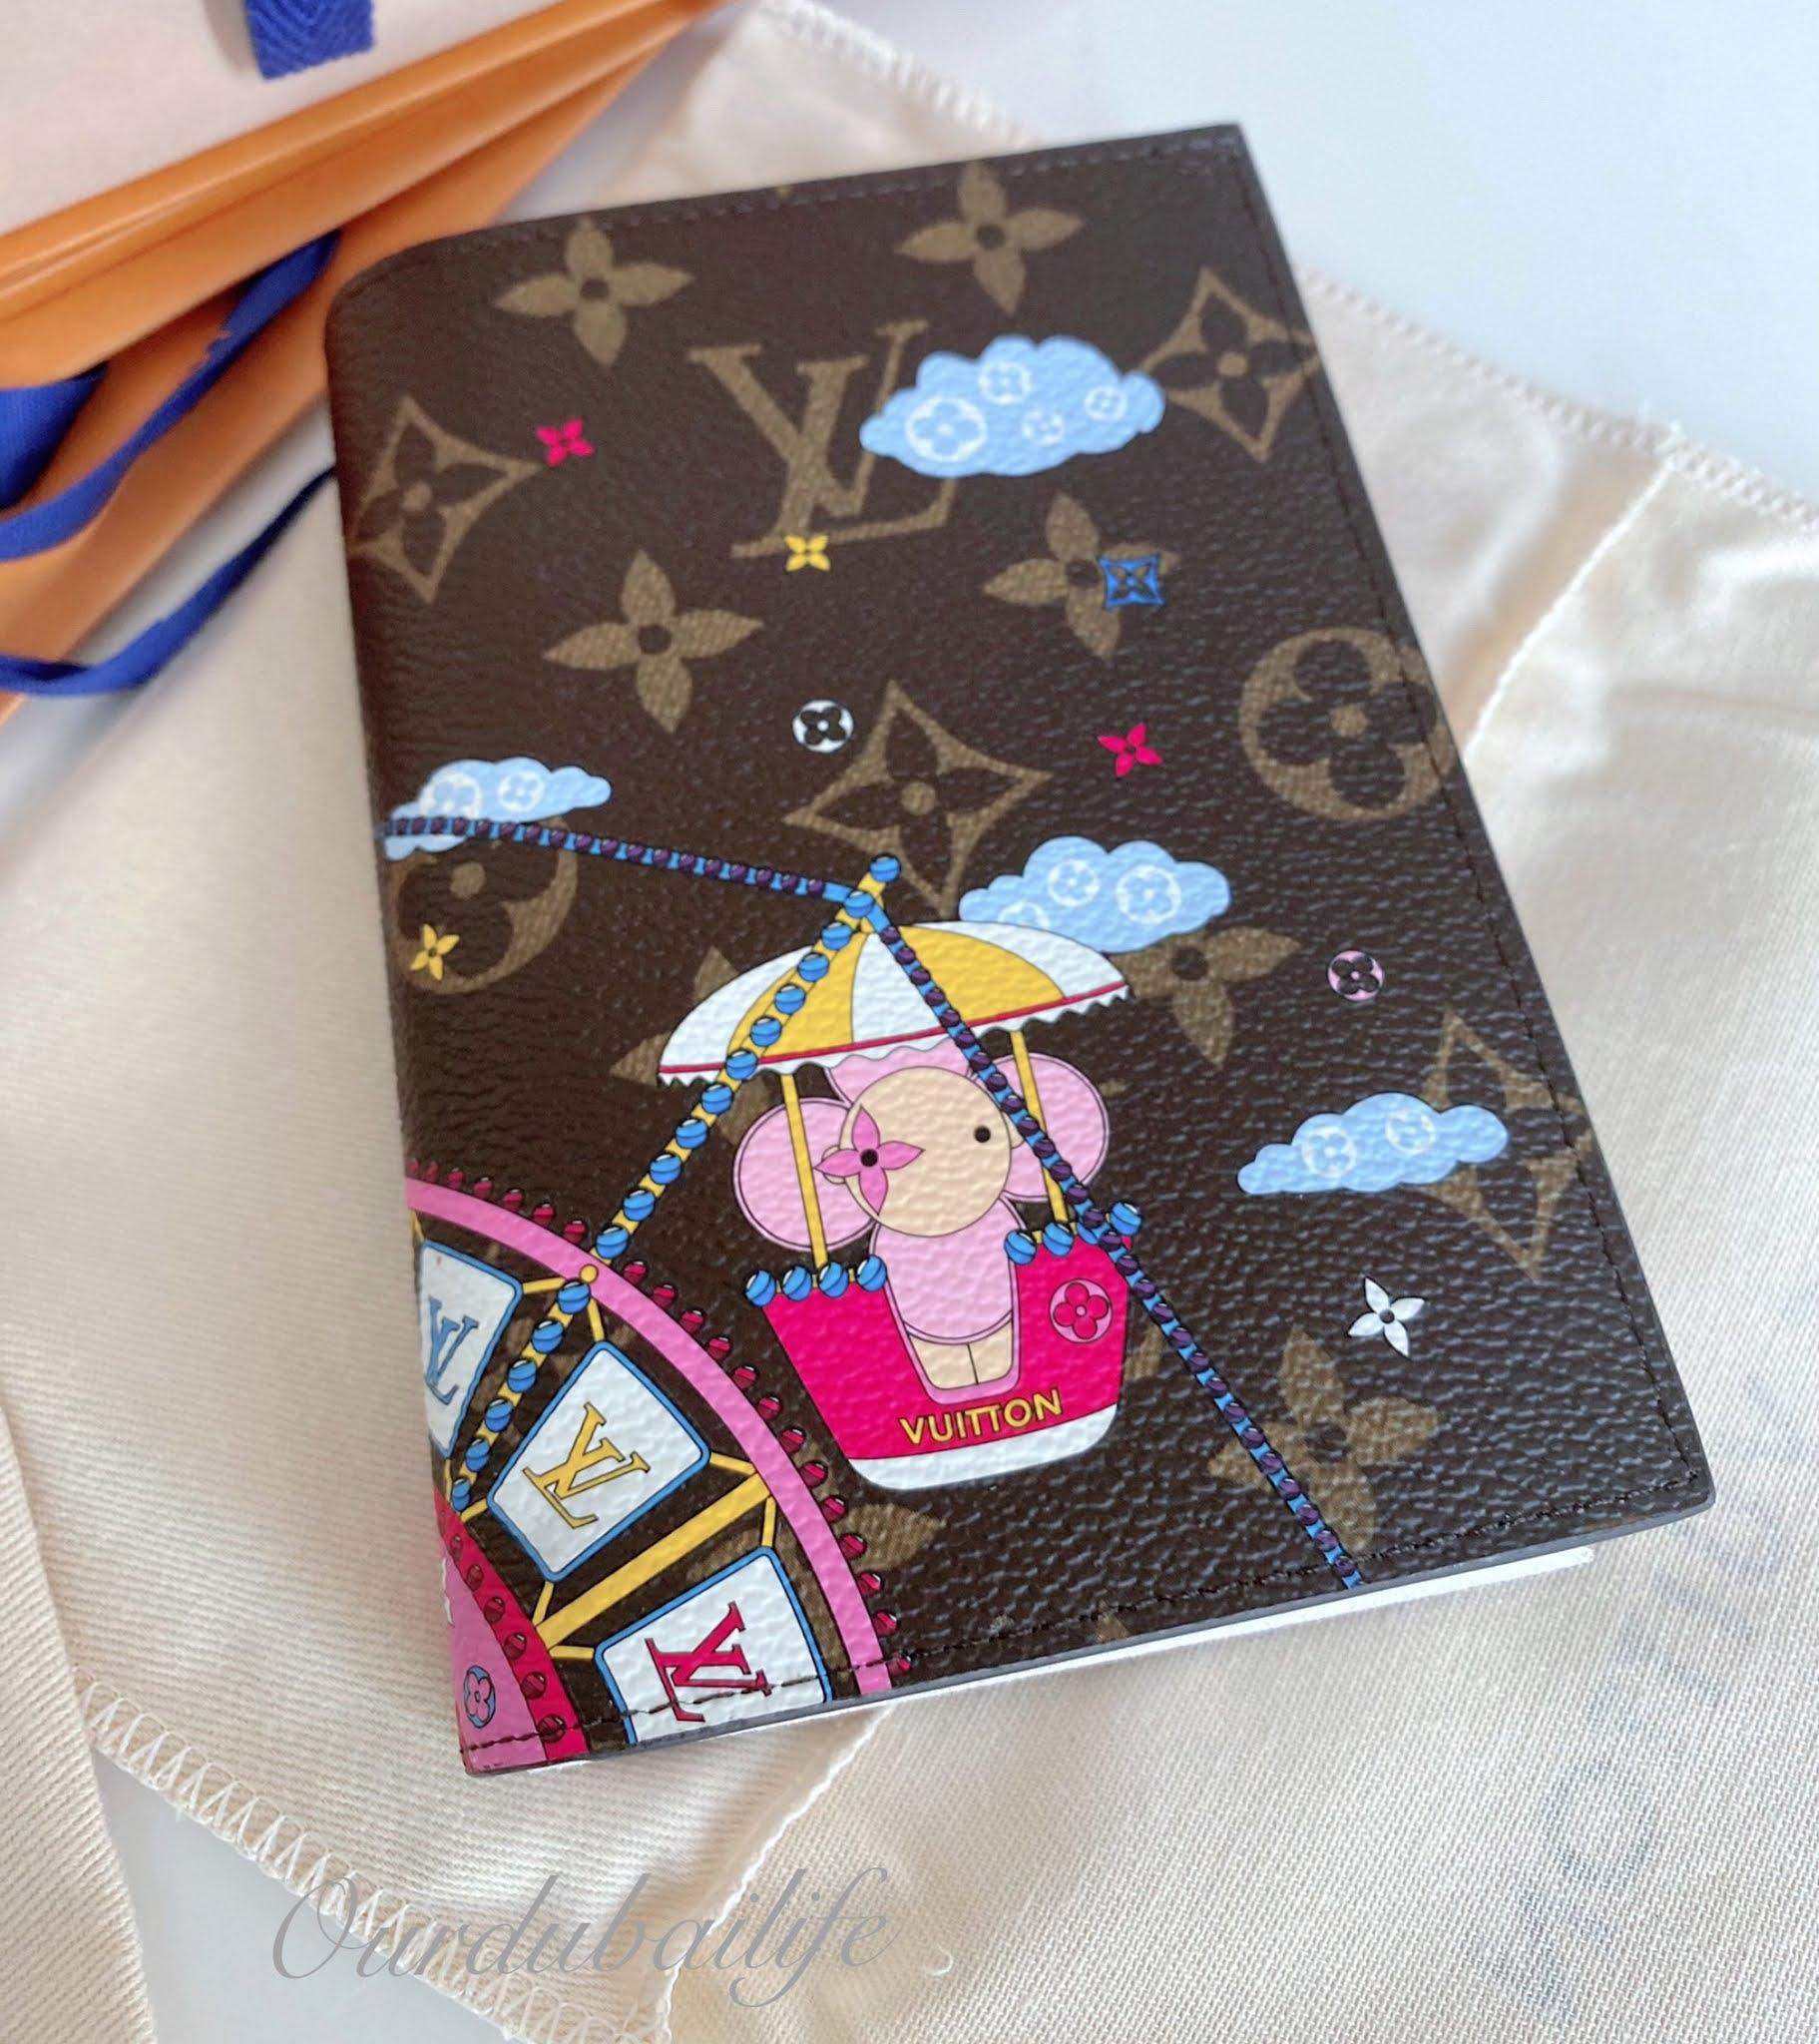 Louis Vuitton Christmas 2020 Reveal Vivienne Ferris Wheel Passport cover